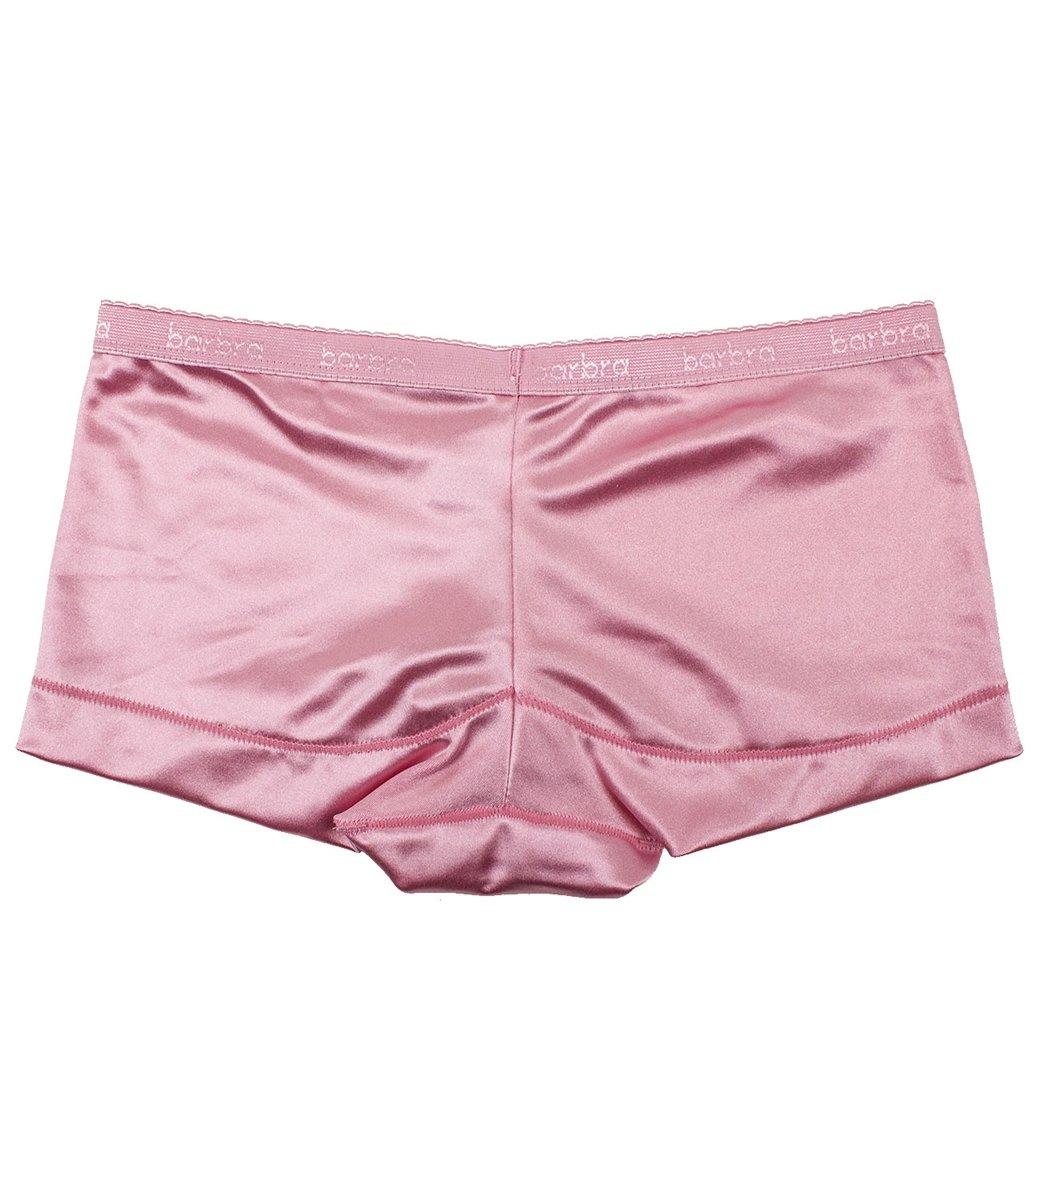 Barbra 6 pack Women's Satin Full Coverage Guaranteed Fit Boyshort Panties(3XL) by Barbra Lingerie (Image #4)